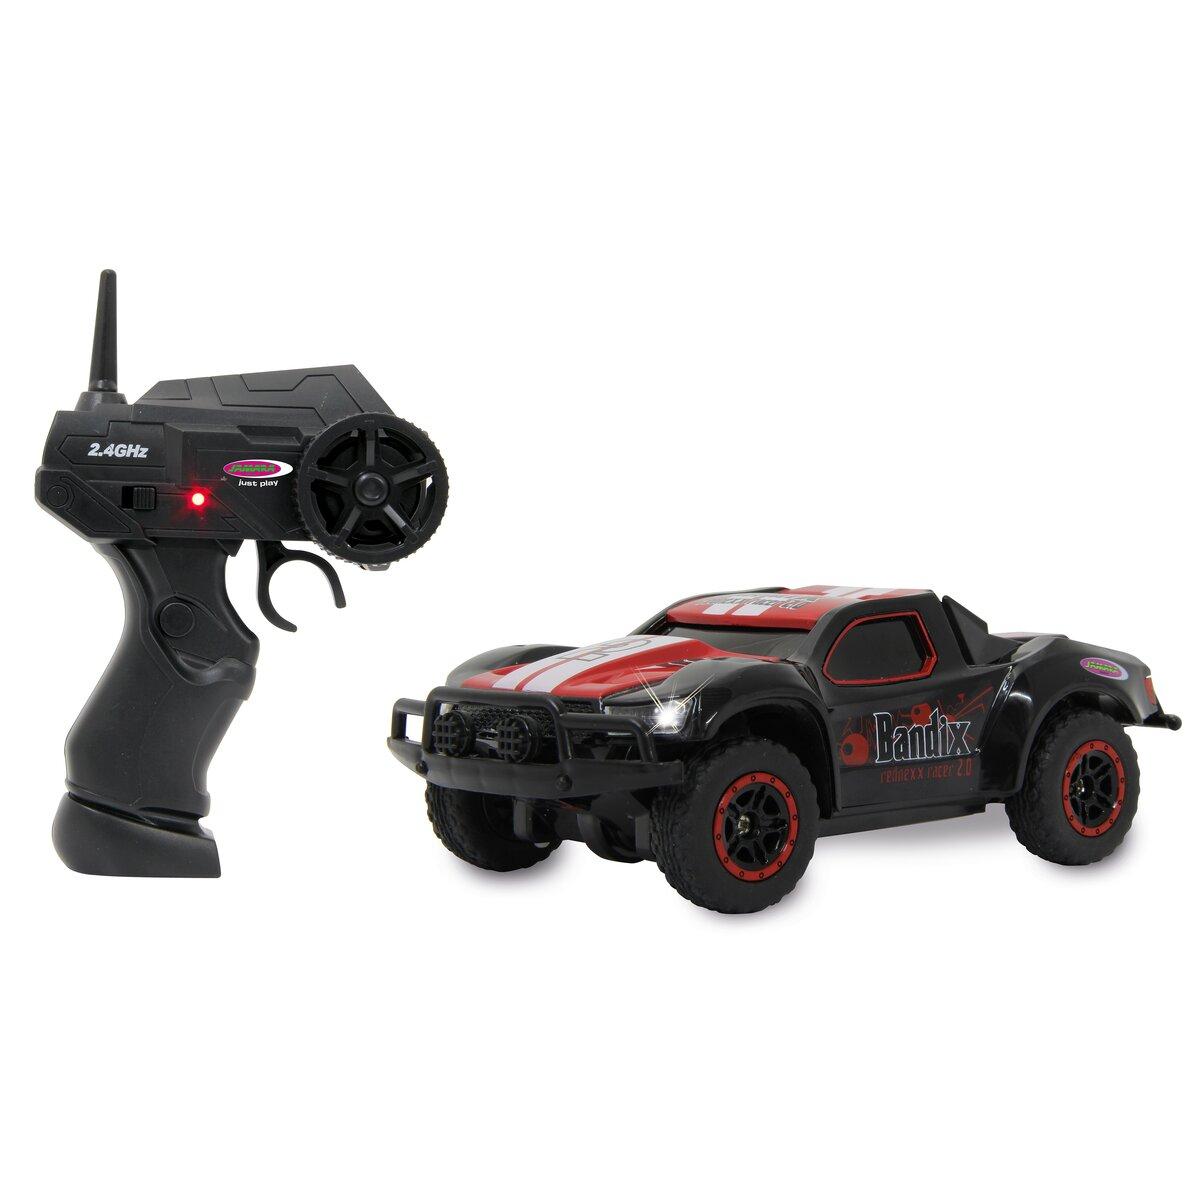 Jamara Bandix Rednexx 2.0 Monstertruck 4WD 2